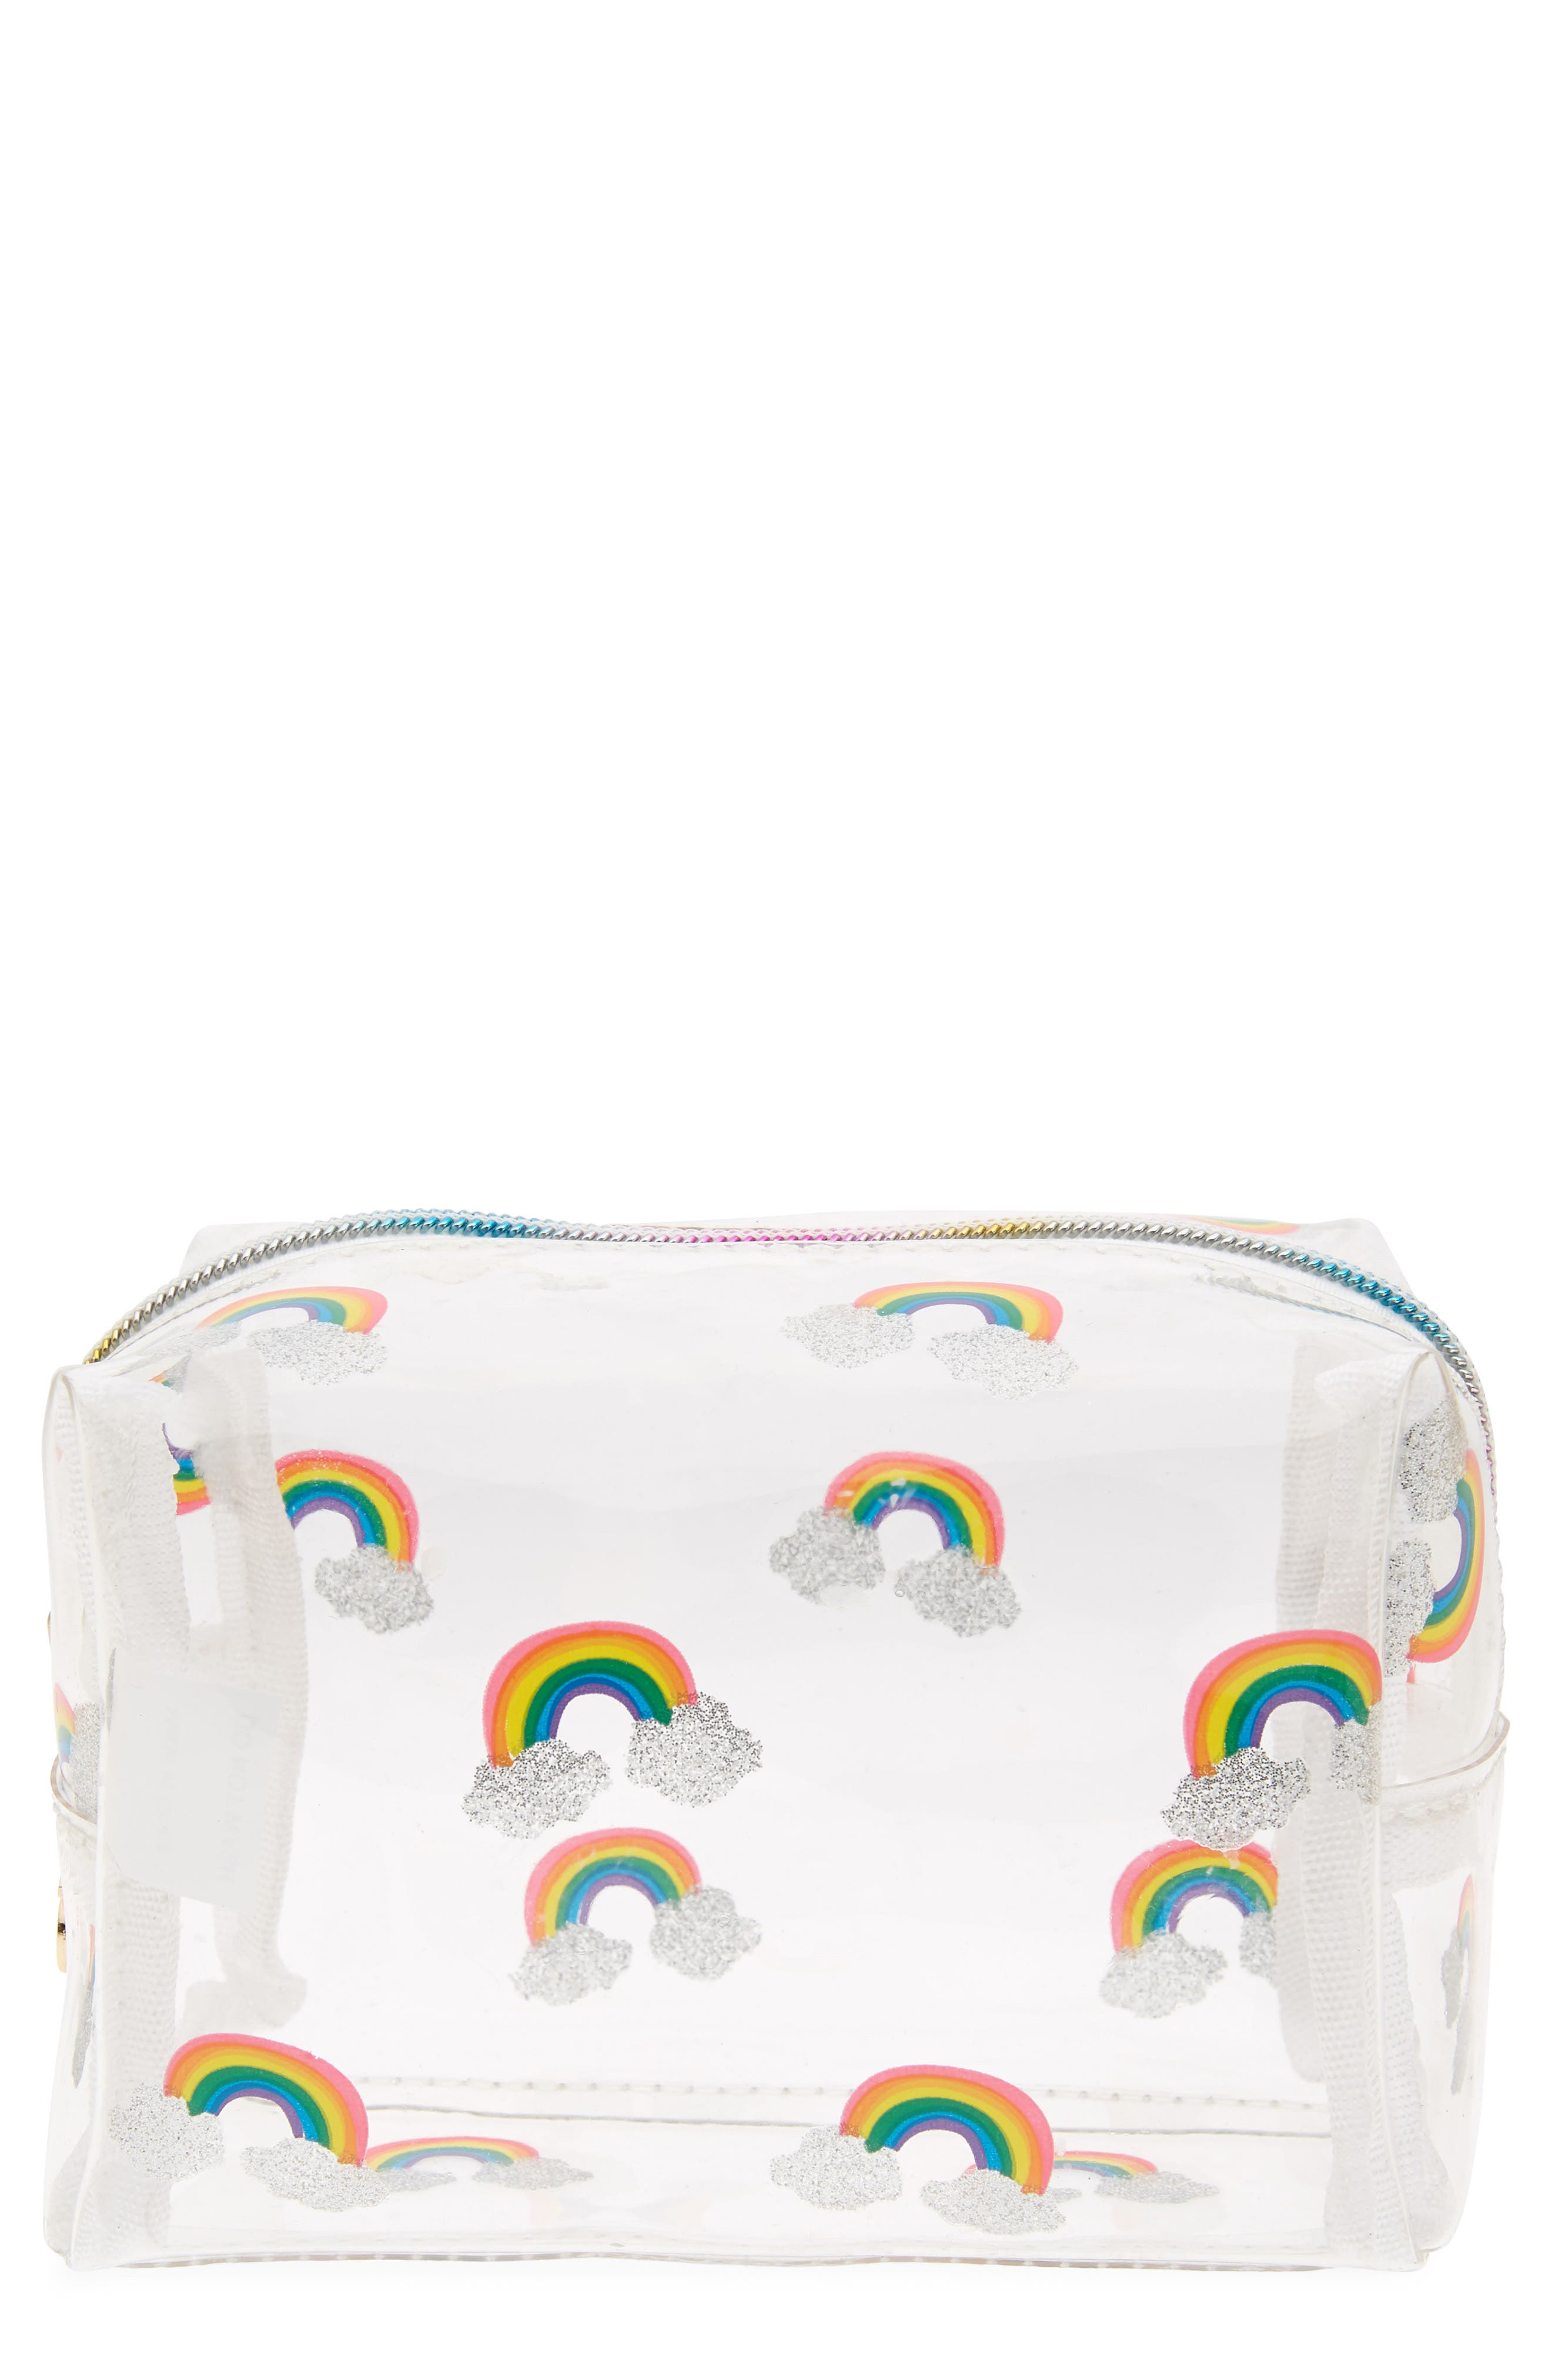 Rainbow Cosmetics Bag,                         Main,                         color, 100